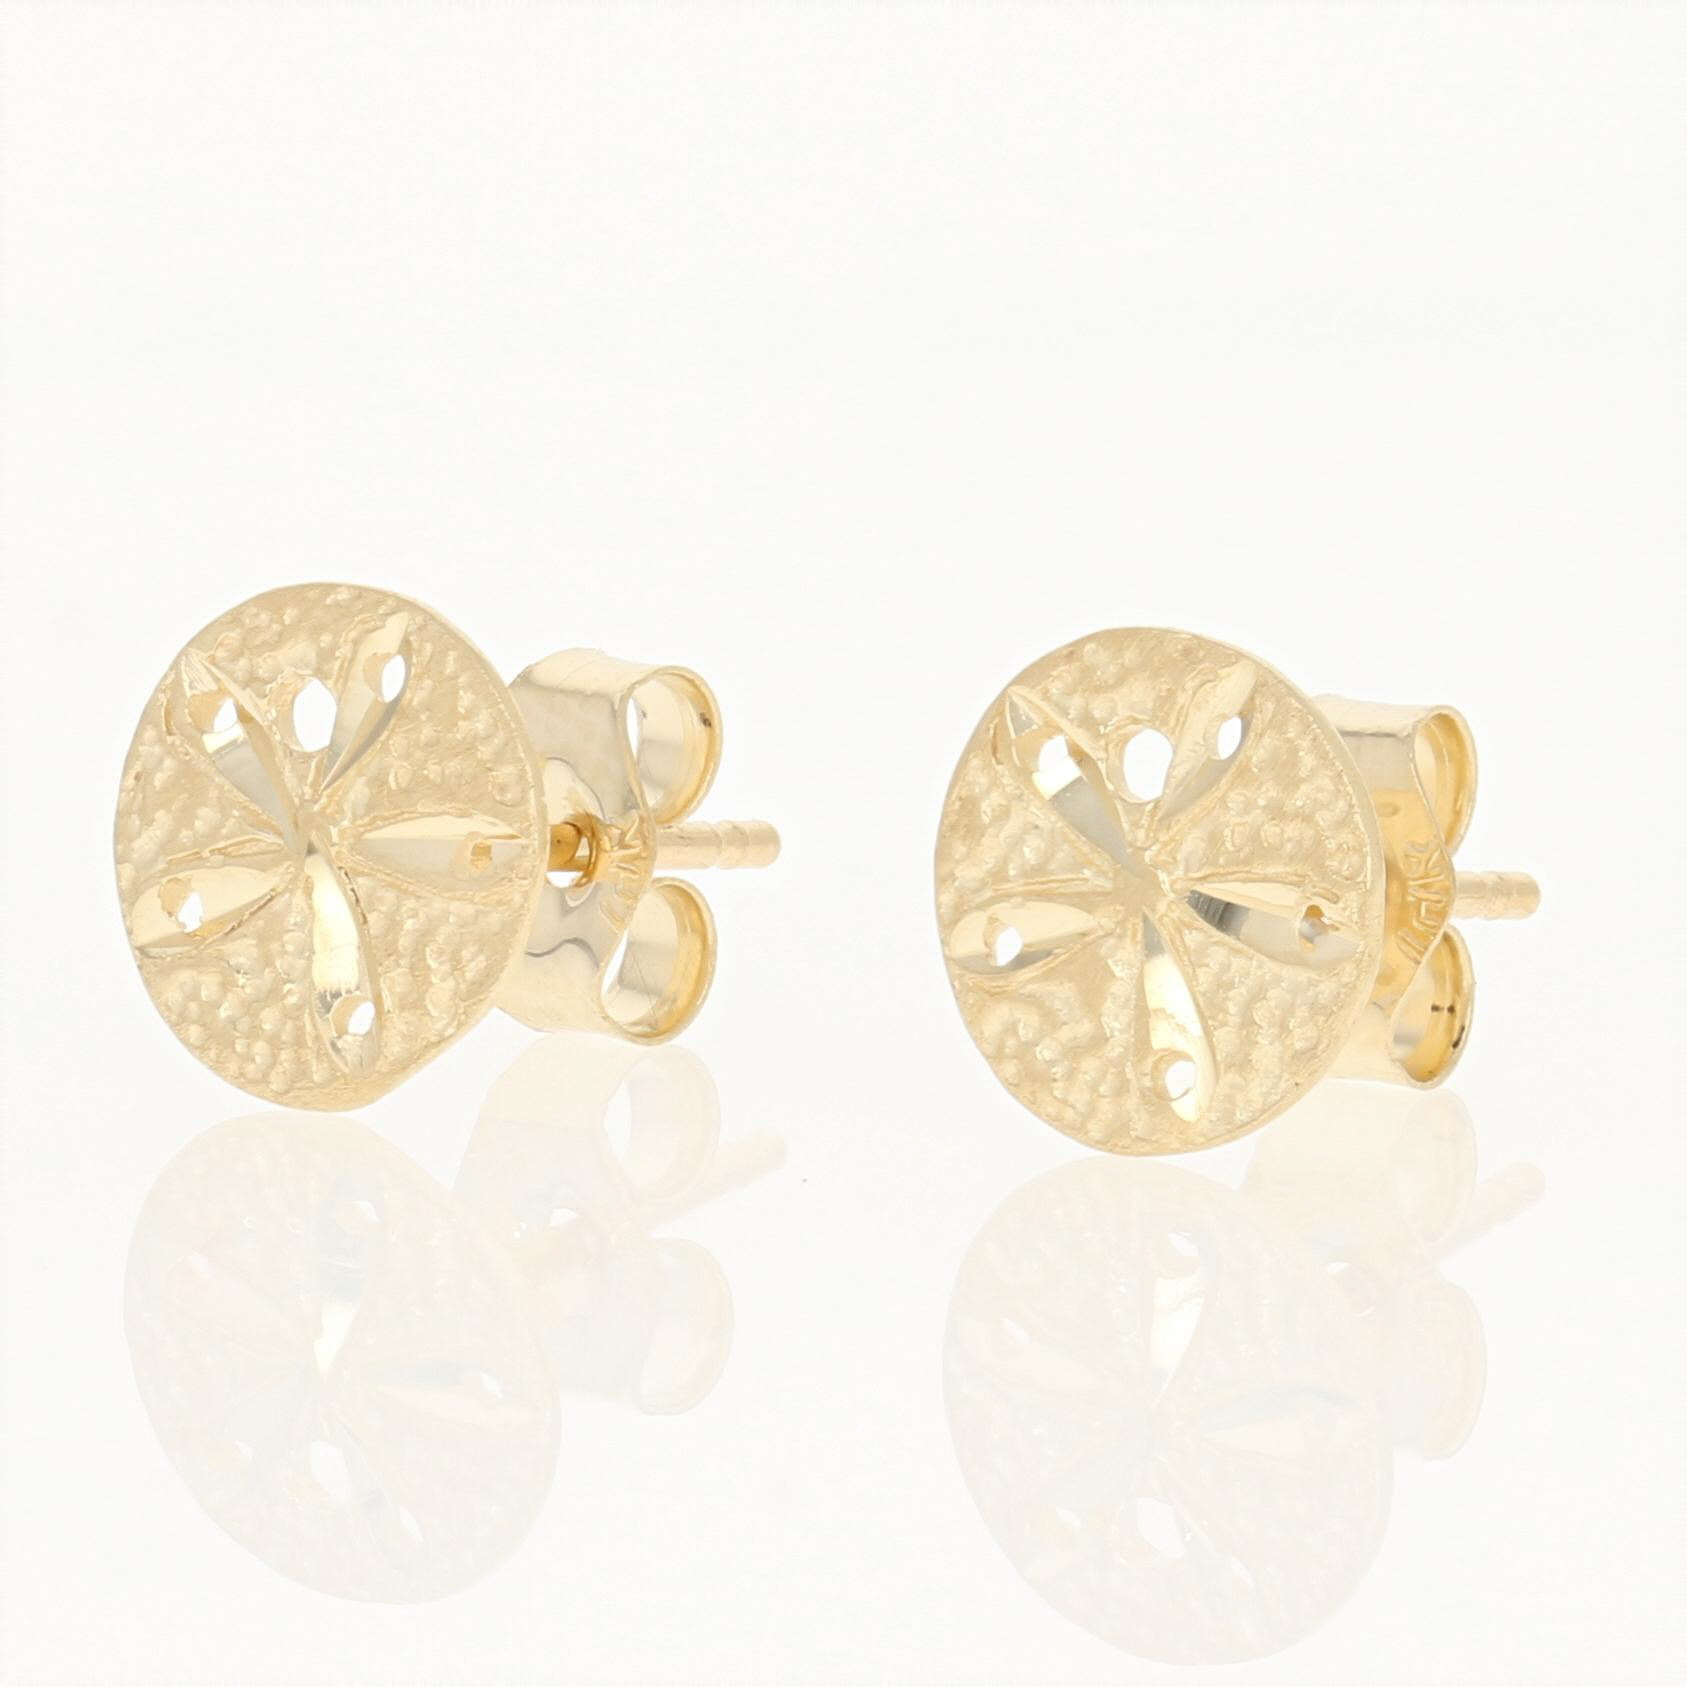 ea3633d99 Sand Dollar Earrings 14k Yellow Gold Beach Nautical Pierced Studs